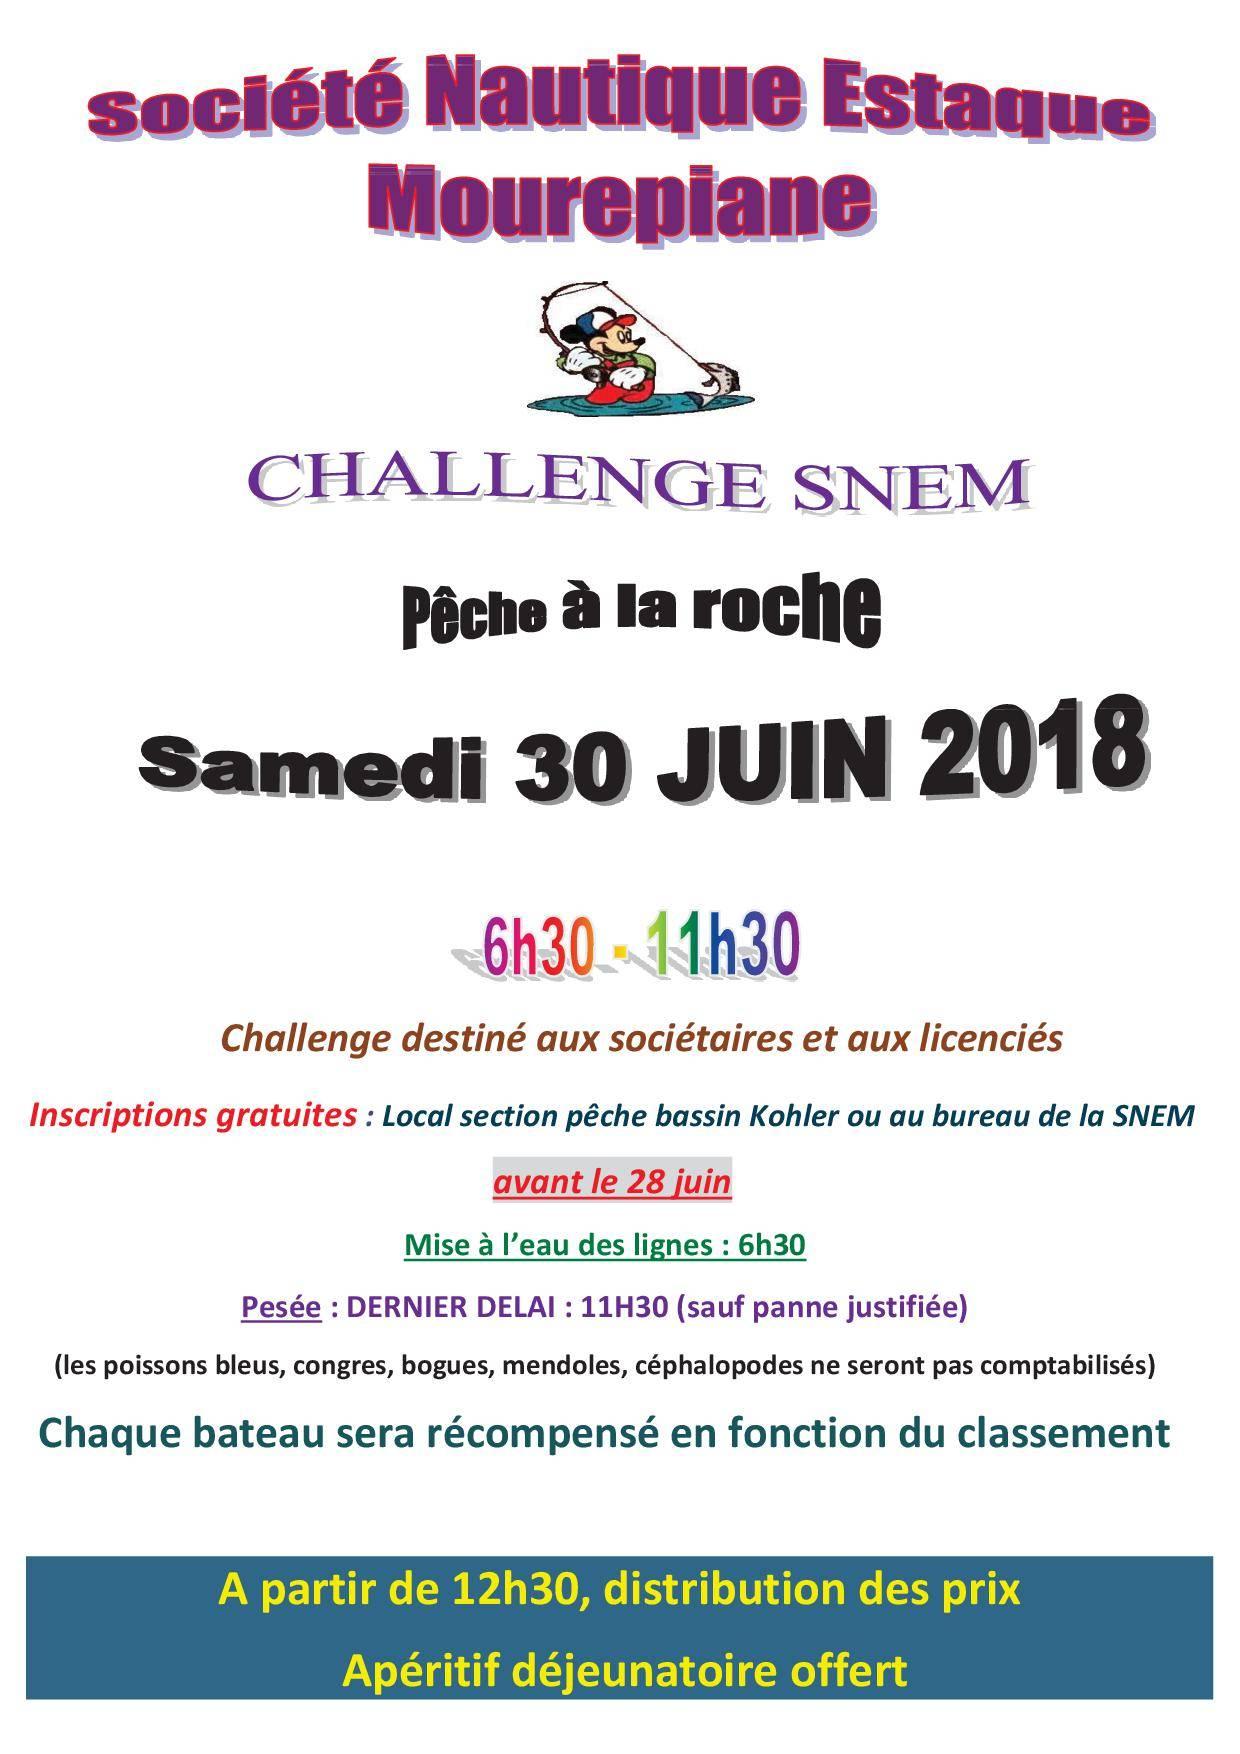 Challenge SNEM samedi 30 juin 2018